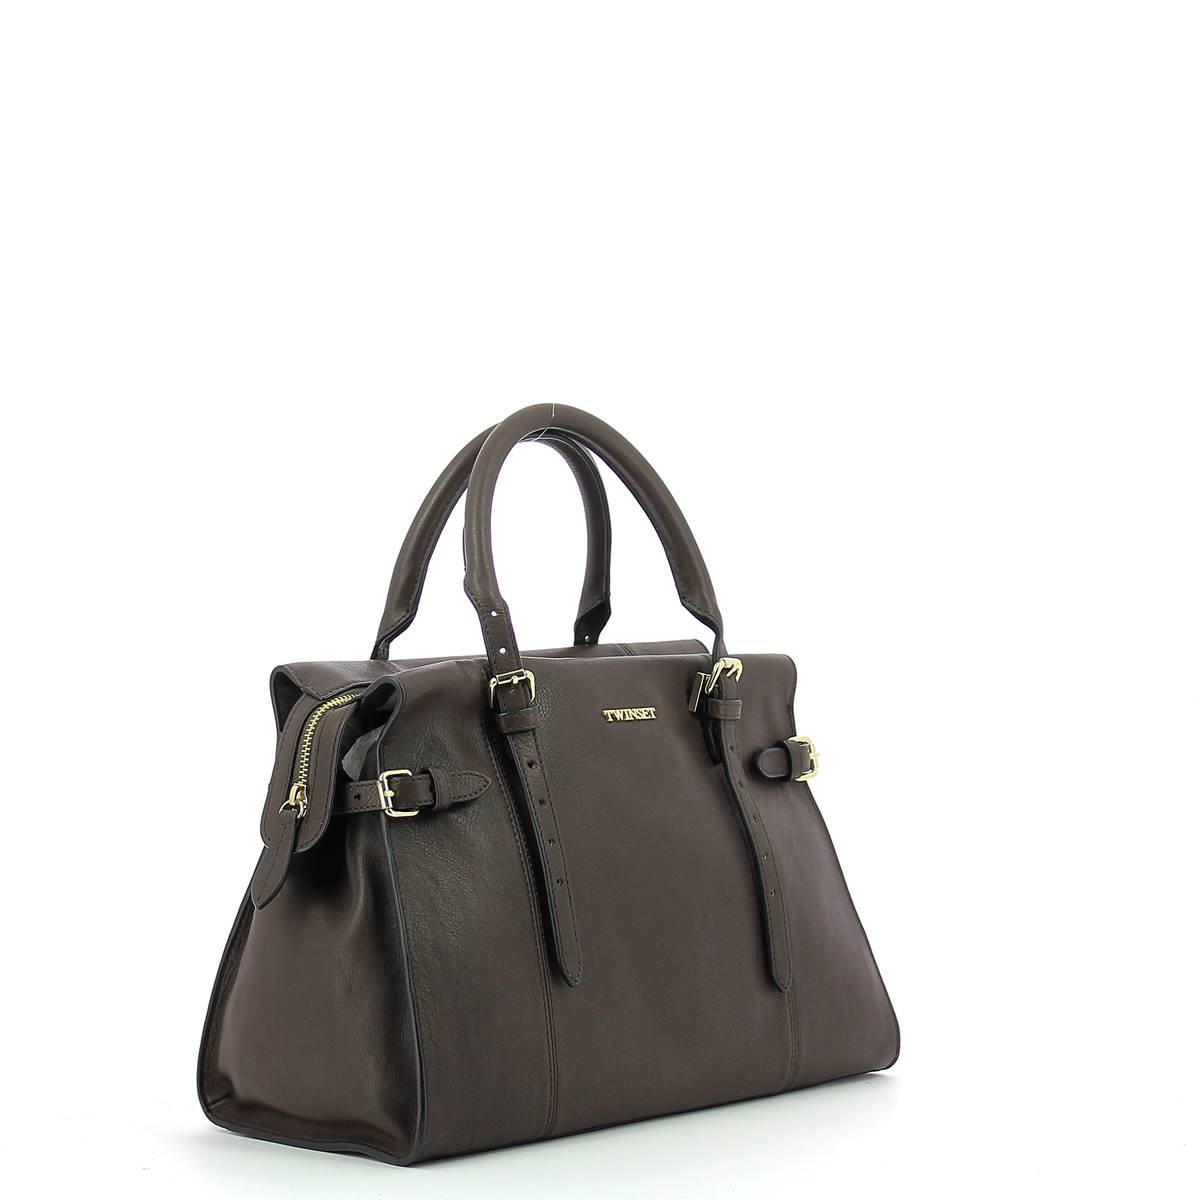 c3d17e4a379f Twin-Set Simona Barbieri - Leather handbag for woman